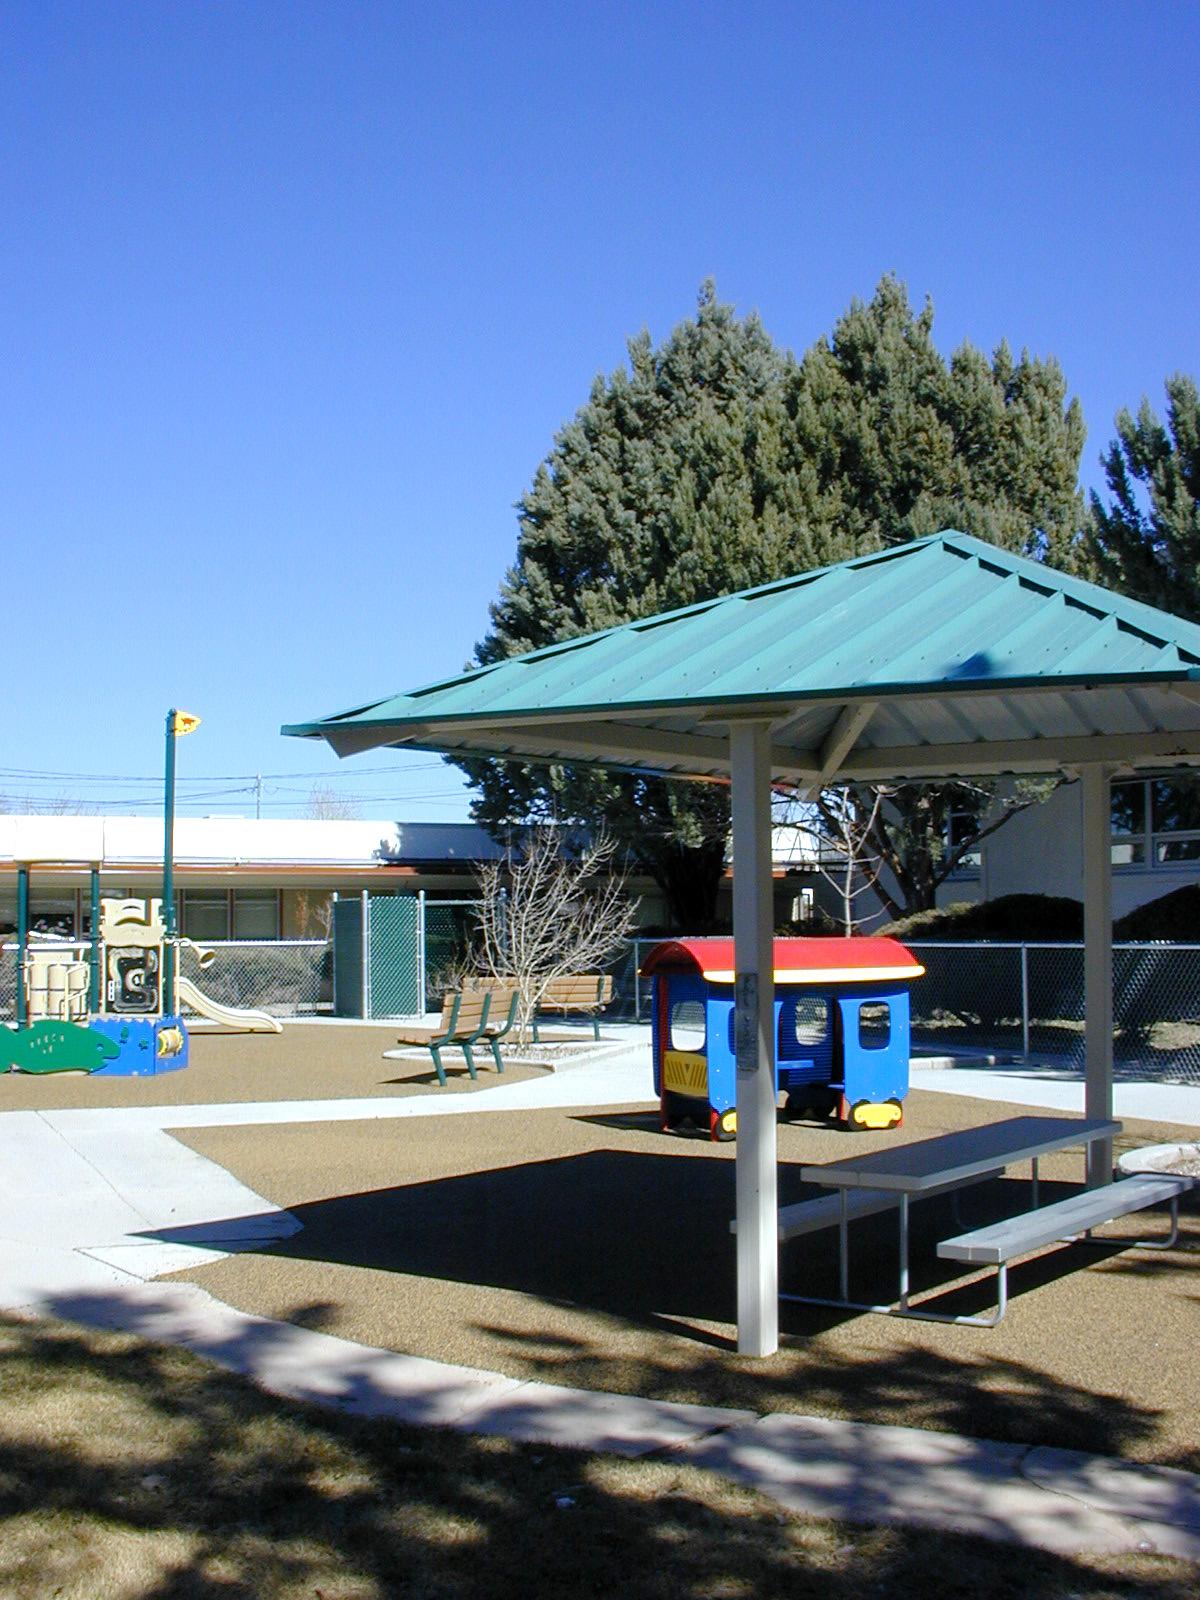 MacArthur_Elementary_School_02.jpg